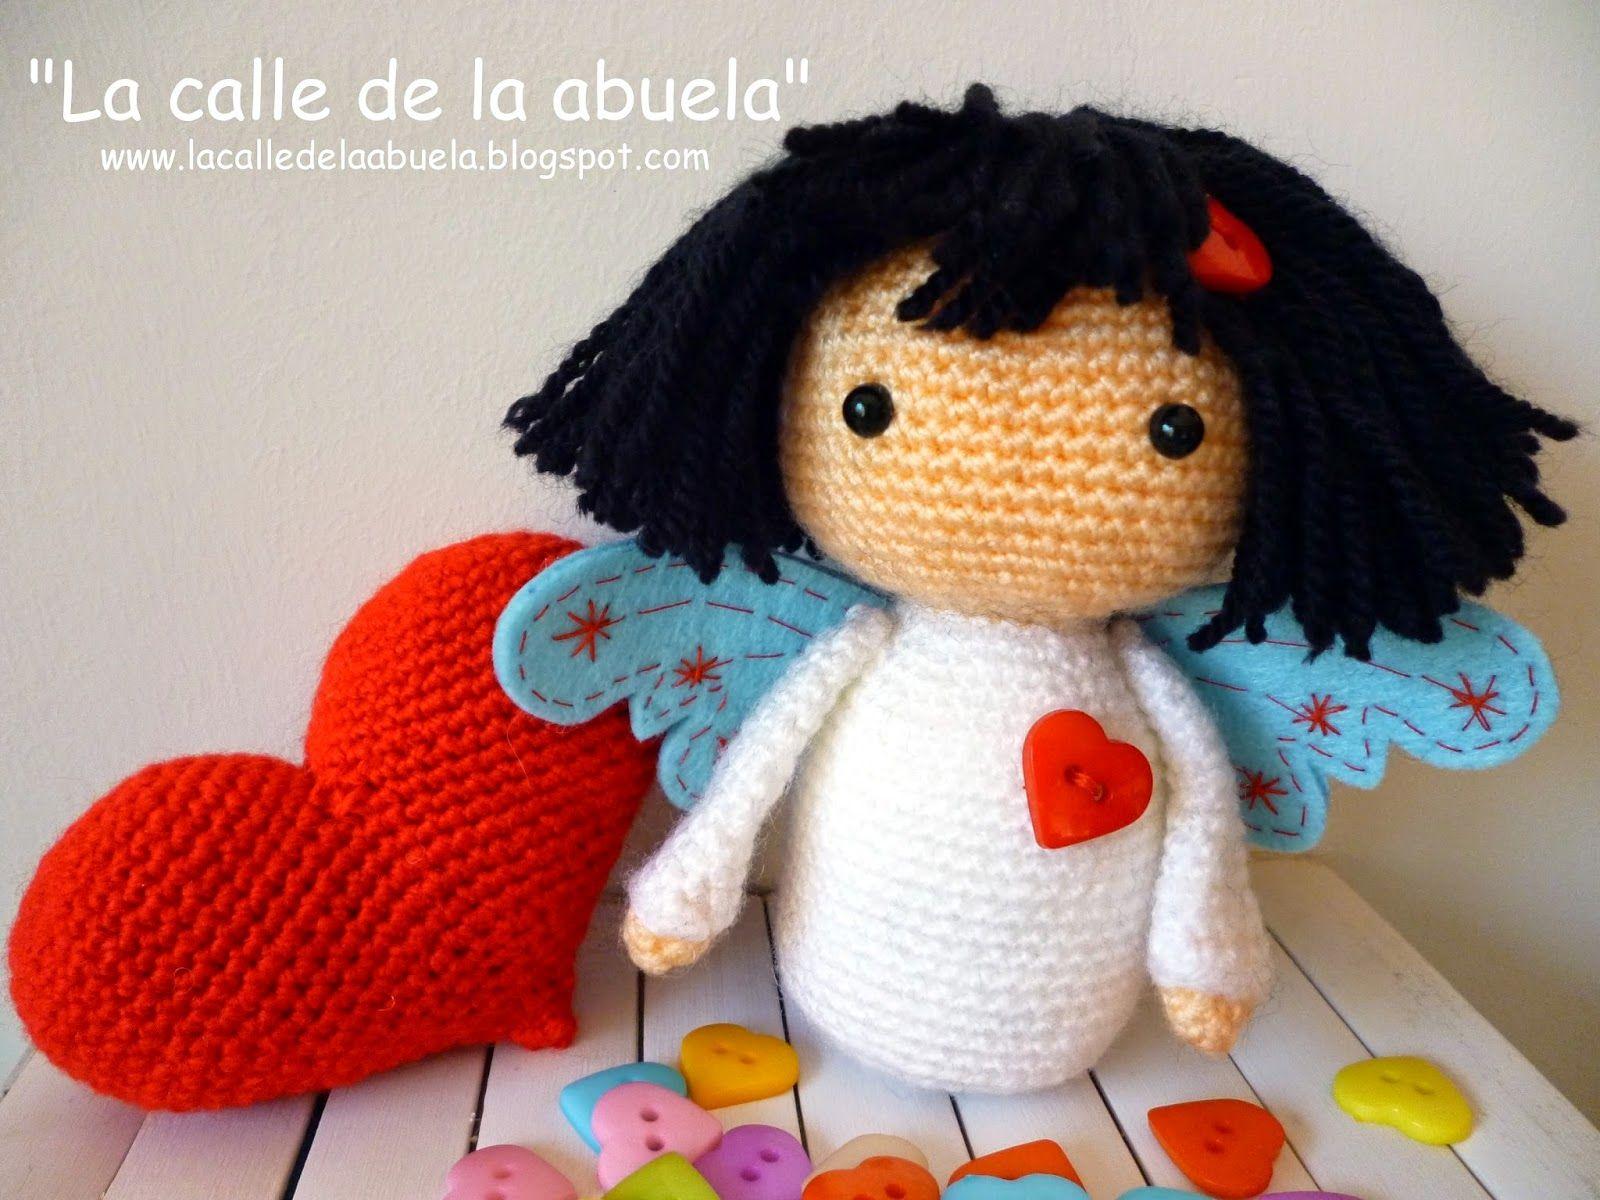 La calle de la abuela. Mi pequeño angelito amoroso | Crochet Dolls ...